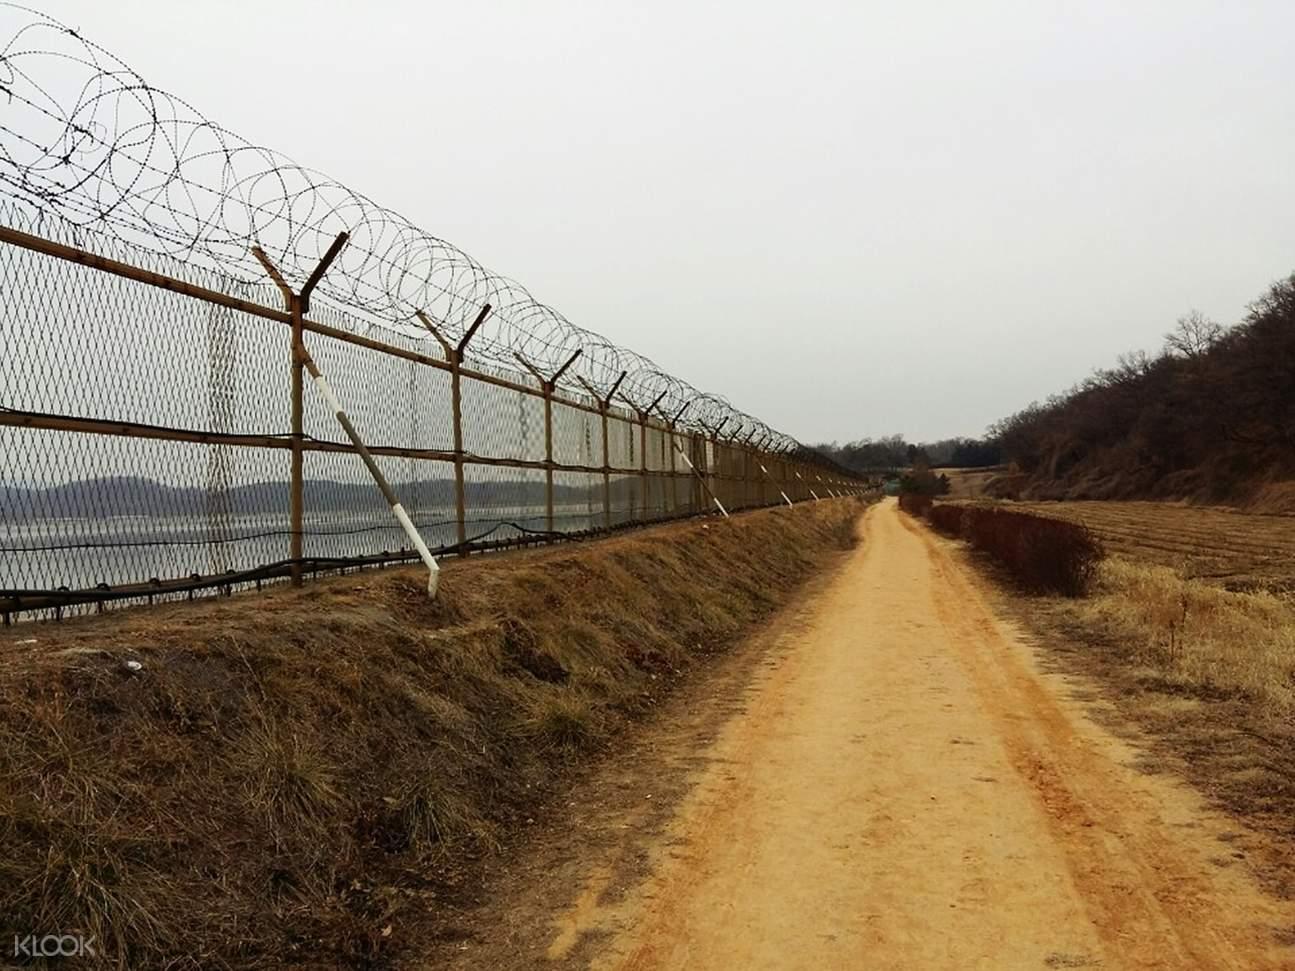 Pyeonghwa (peace) Nurigil Road